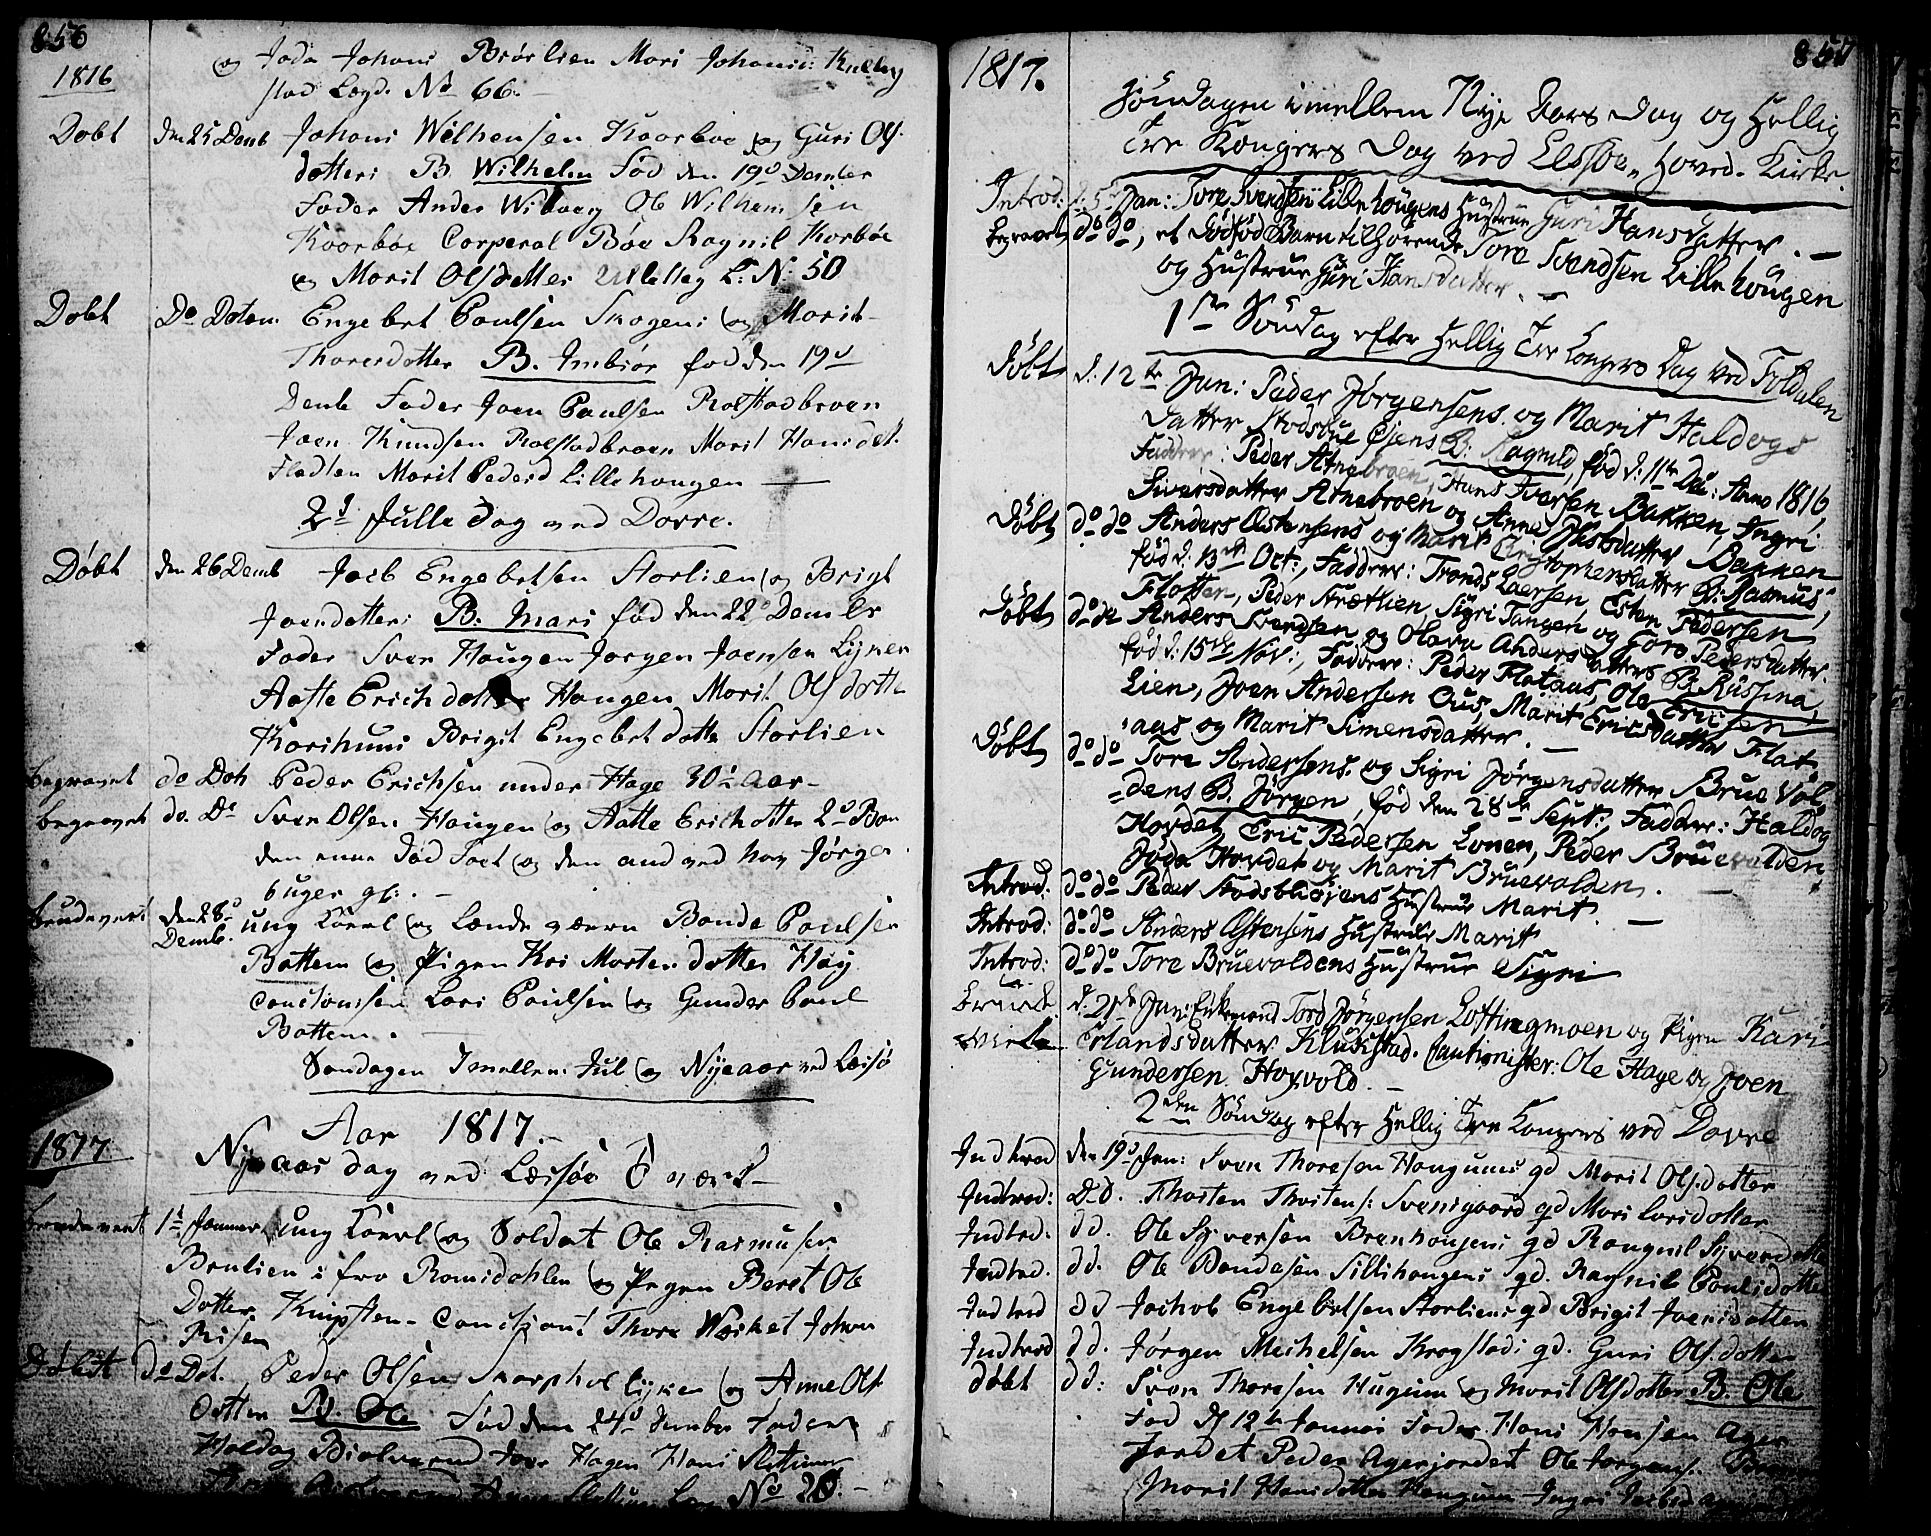 SAH, Lesja prestekontor, Ministerialbok nr. 3, 1777-1819, s. 856-857